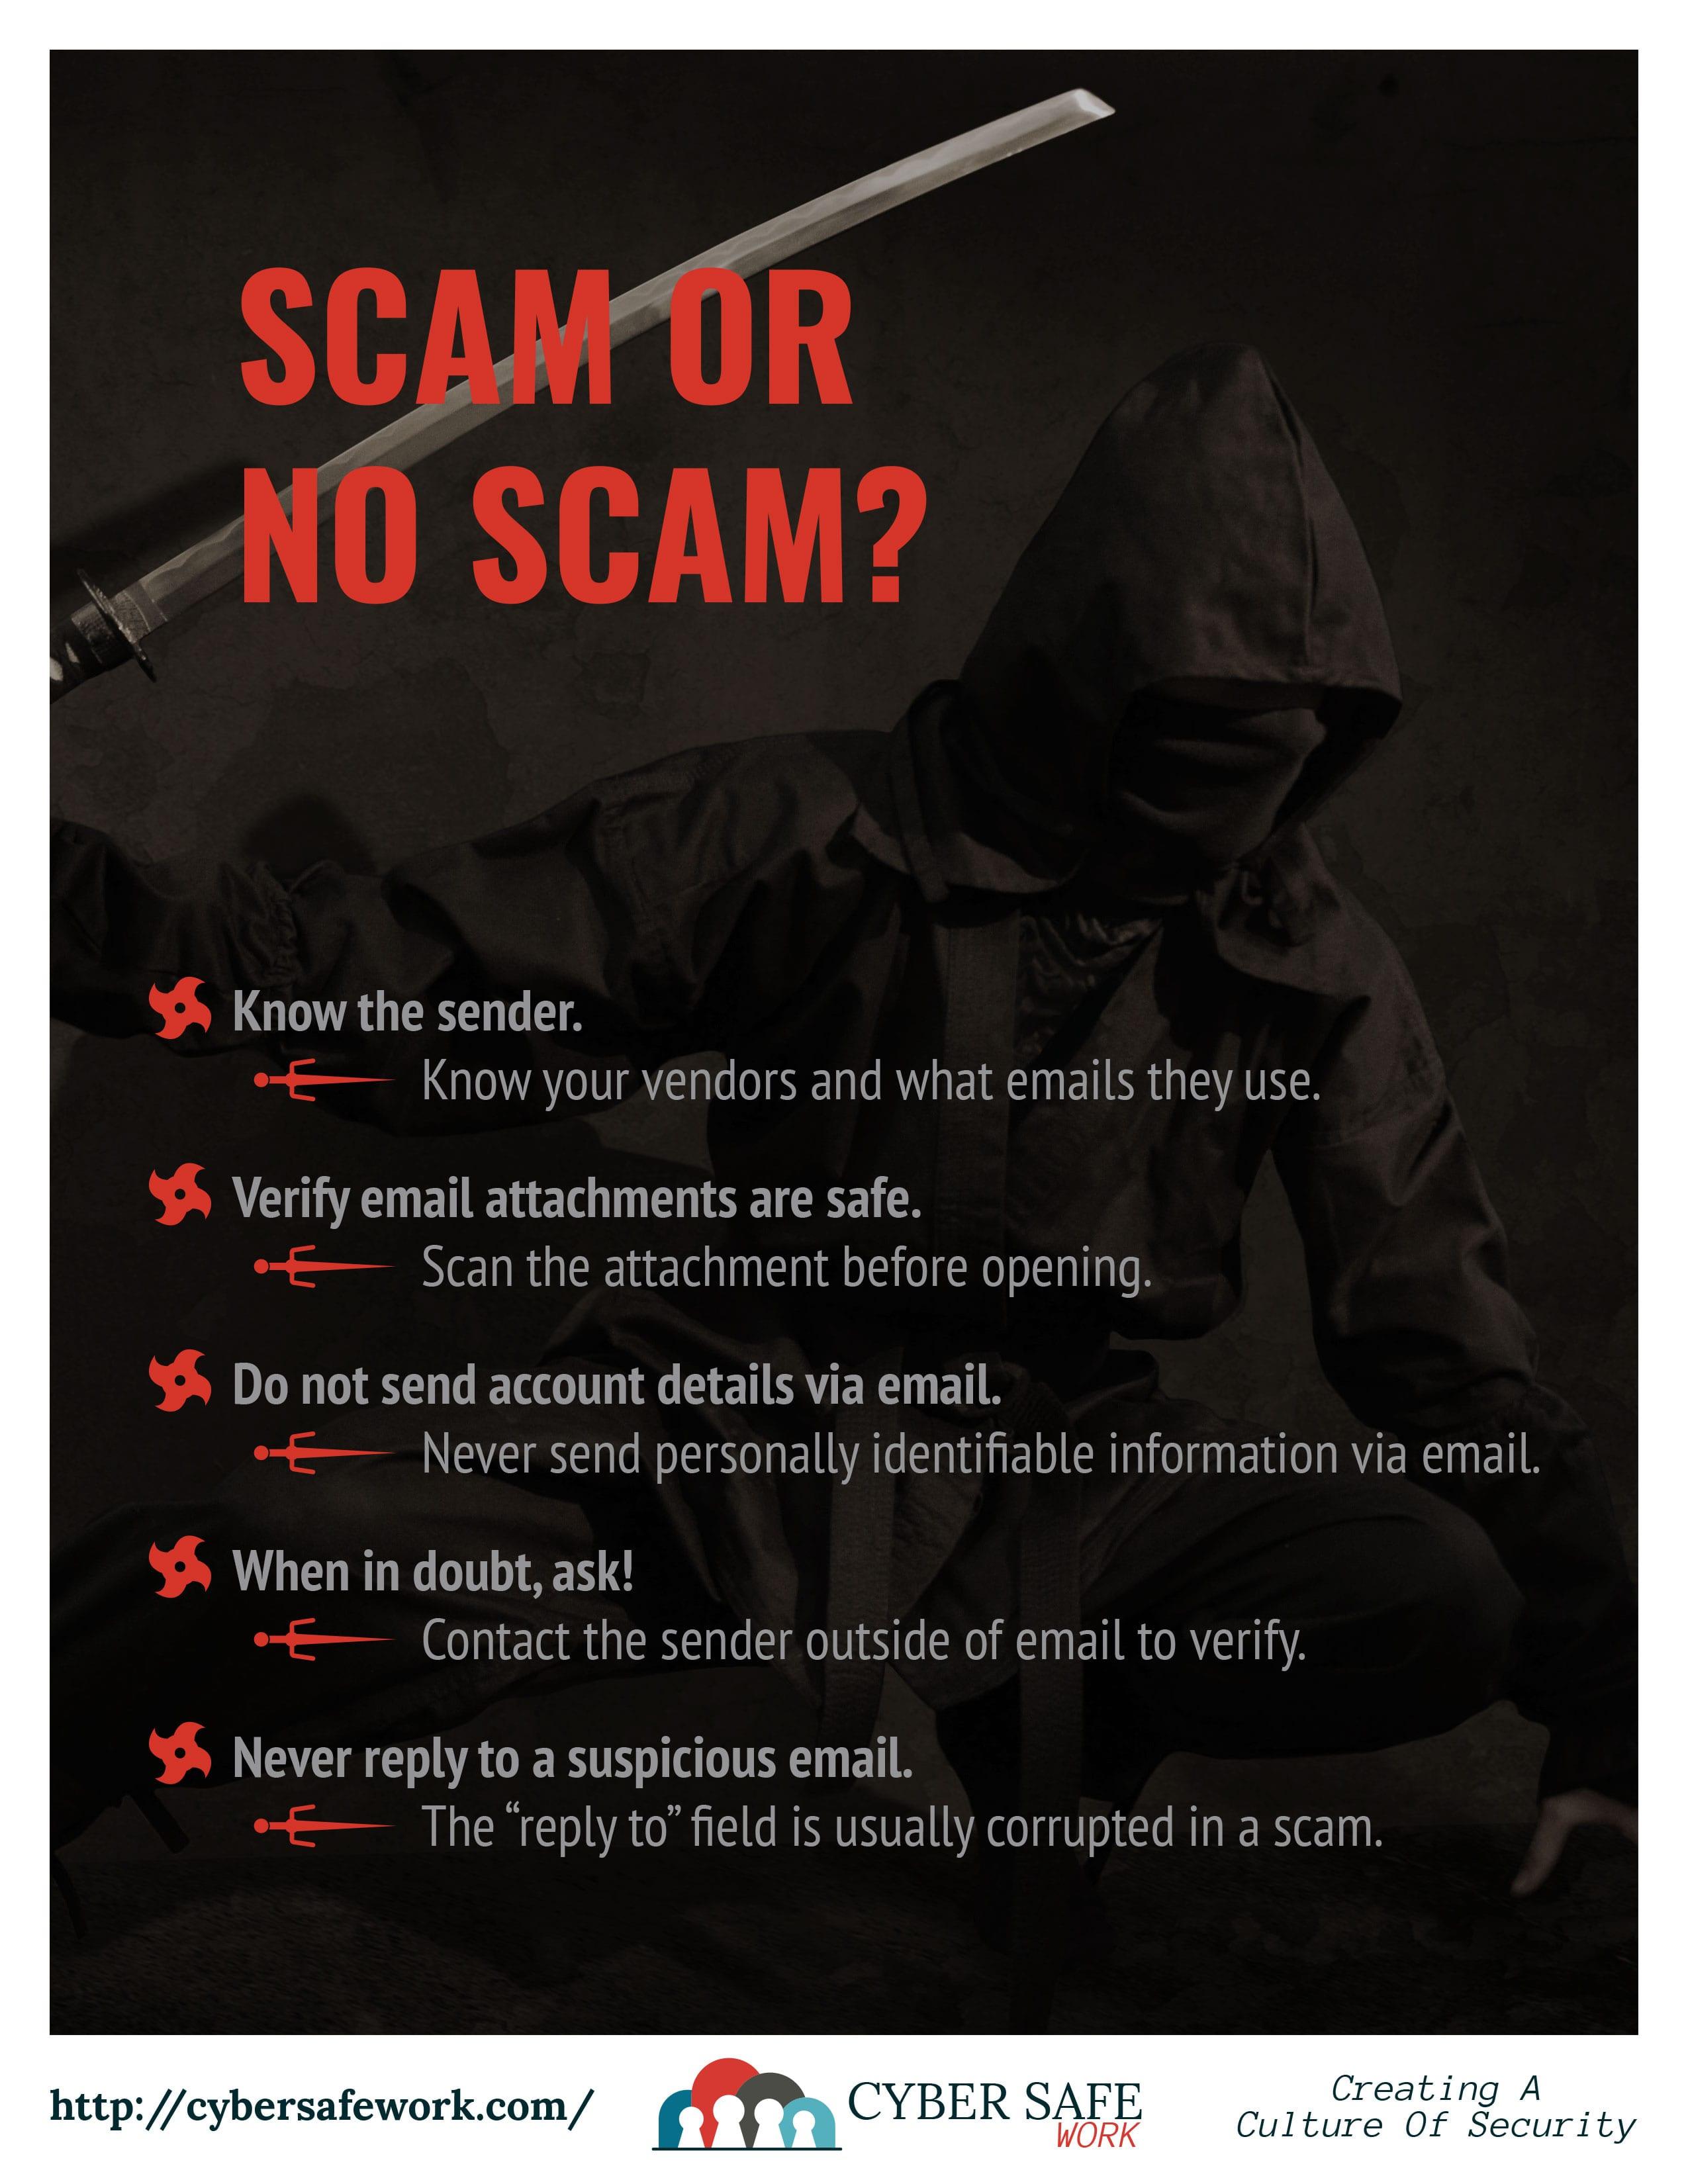 Cyber Safe Work Security Awareness Poster January 2019 -